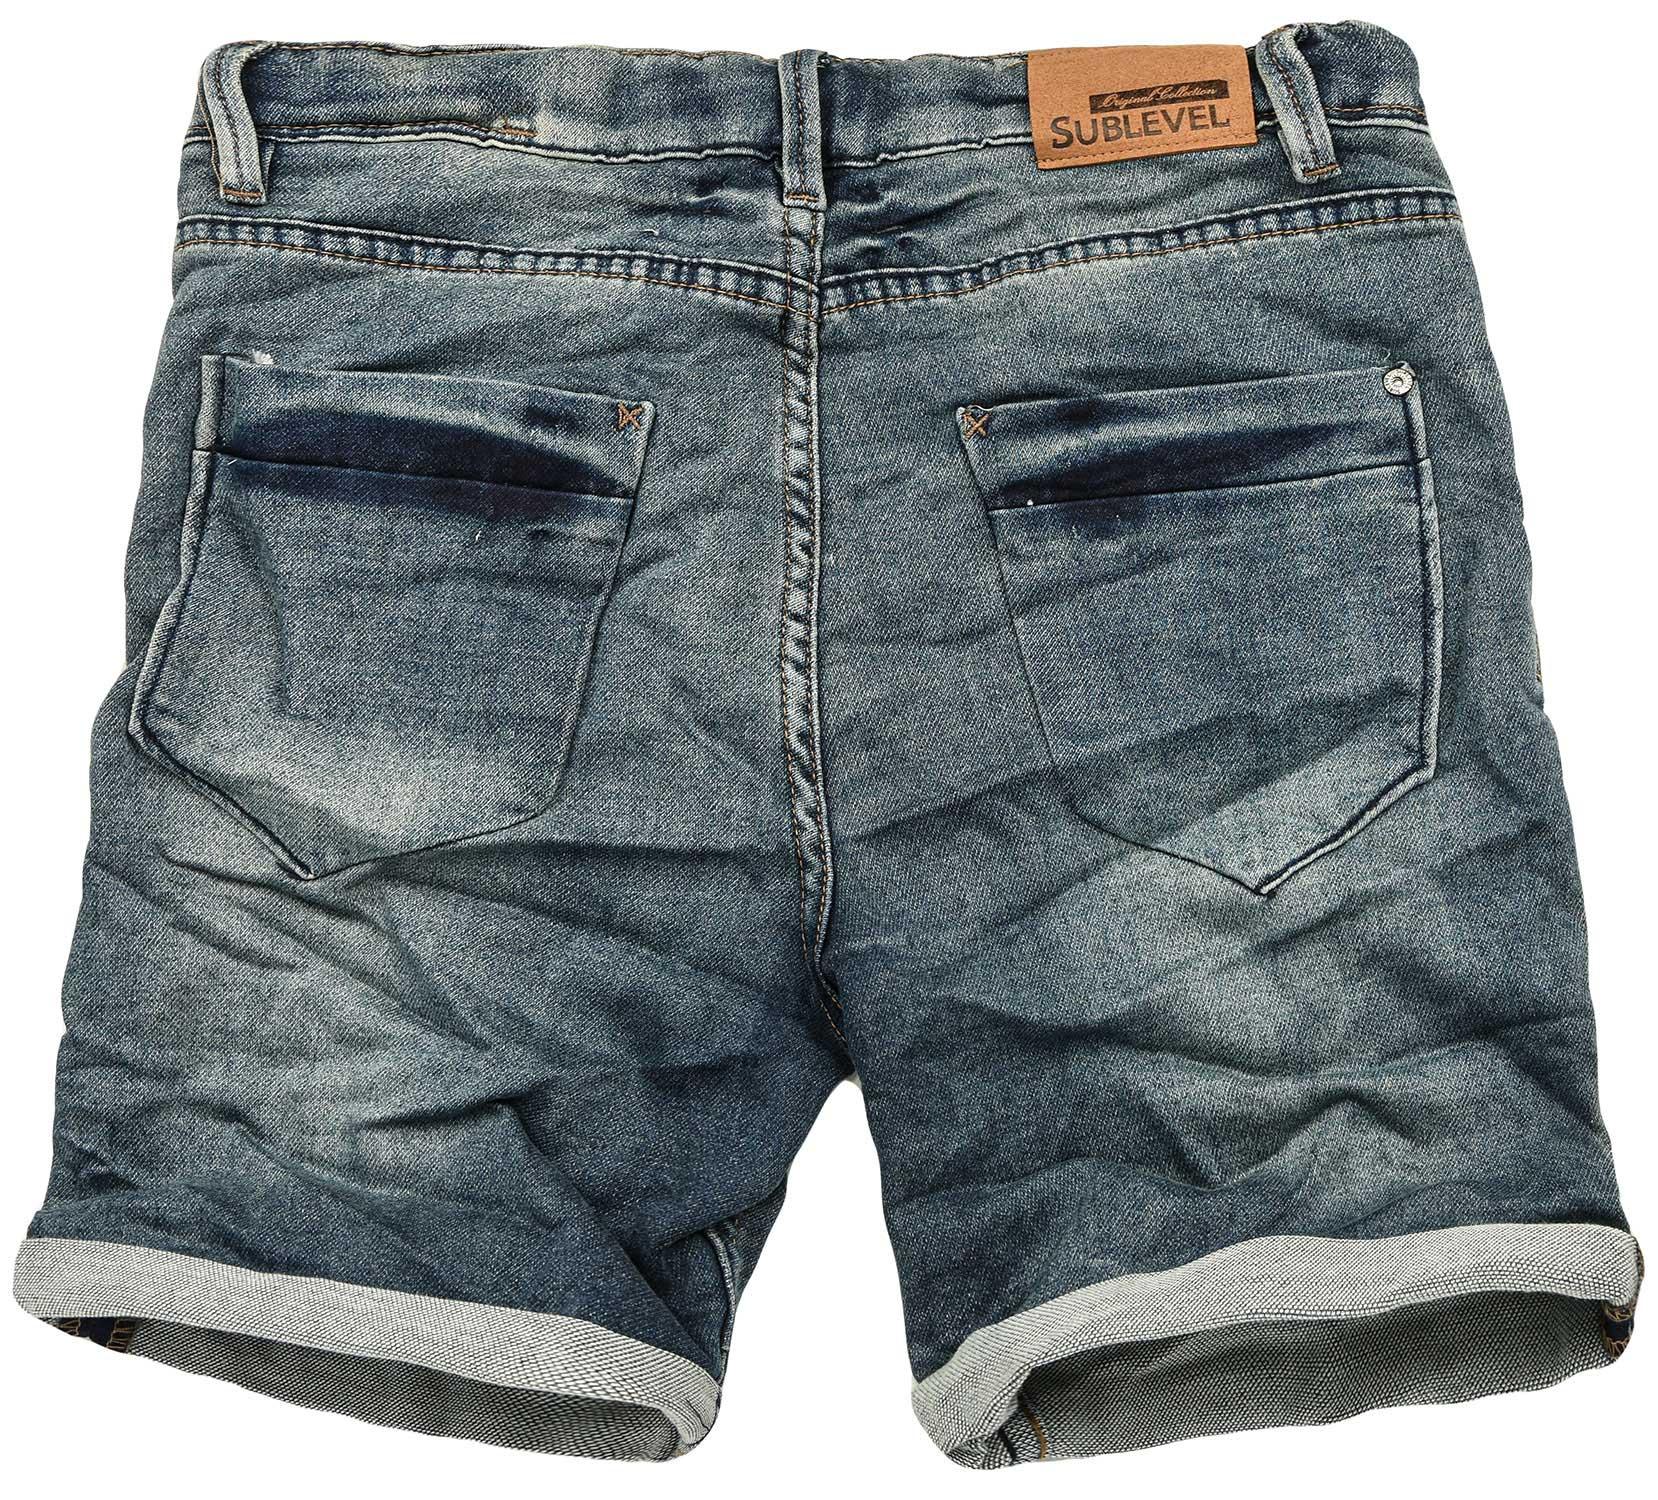 Sublevel-Herren-Sweat-Jeans-Shorts-kurze-Hose-Bermuda-Sommer-Sweathose-Slim-NEU Indexbild 44